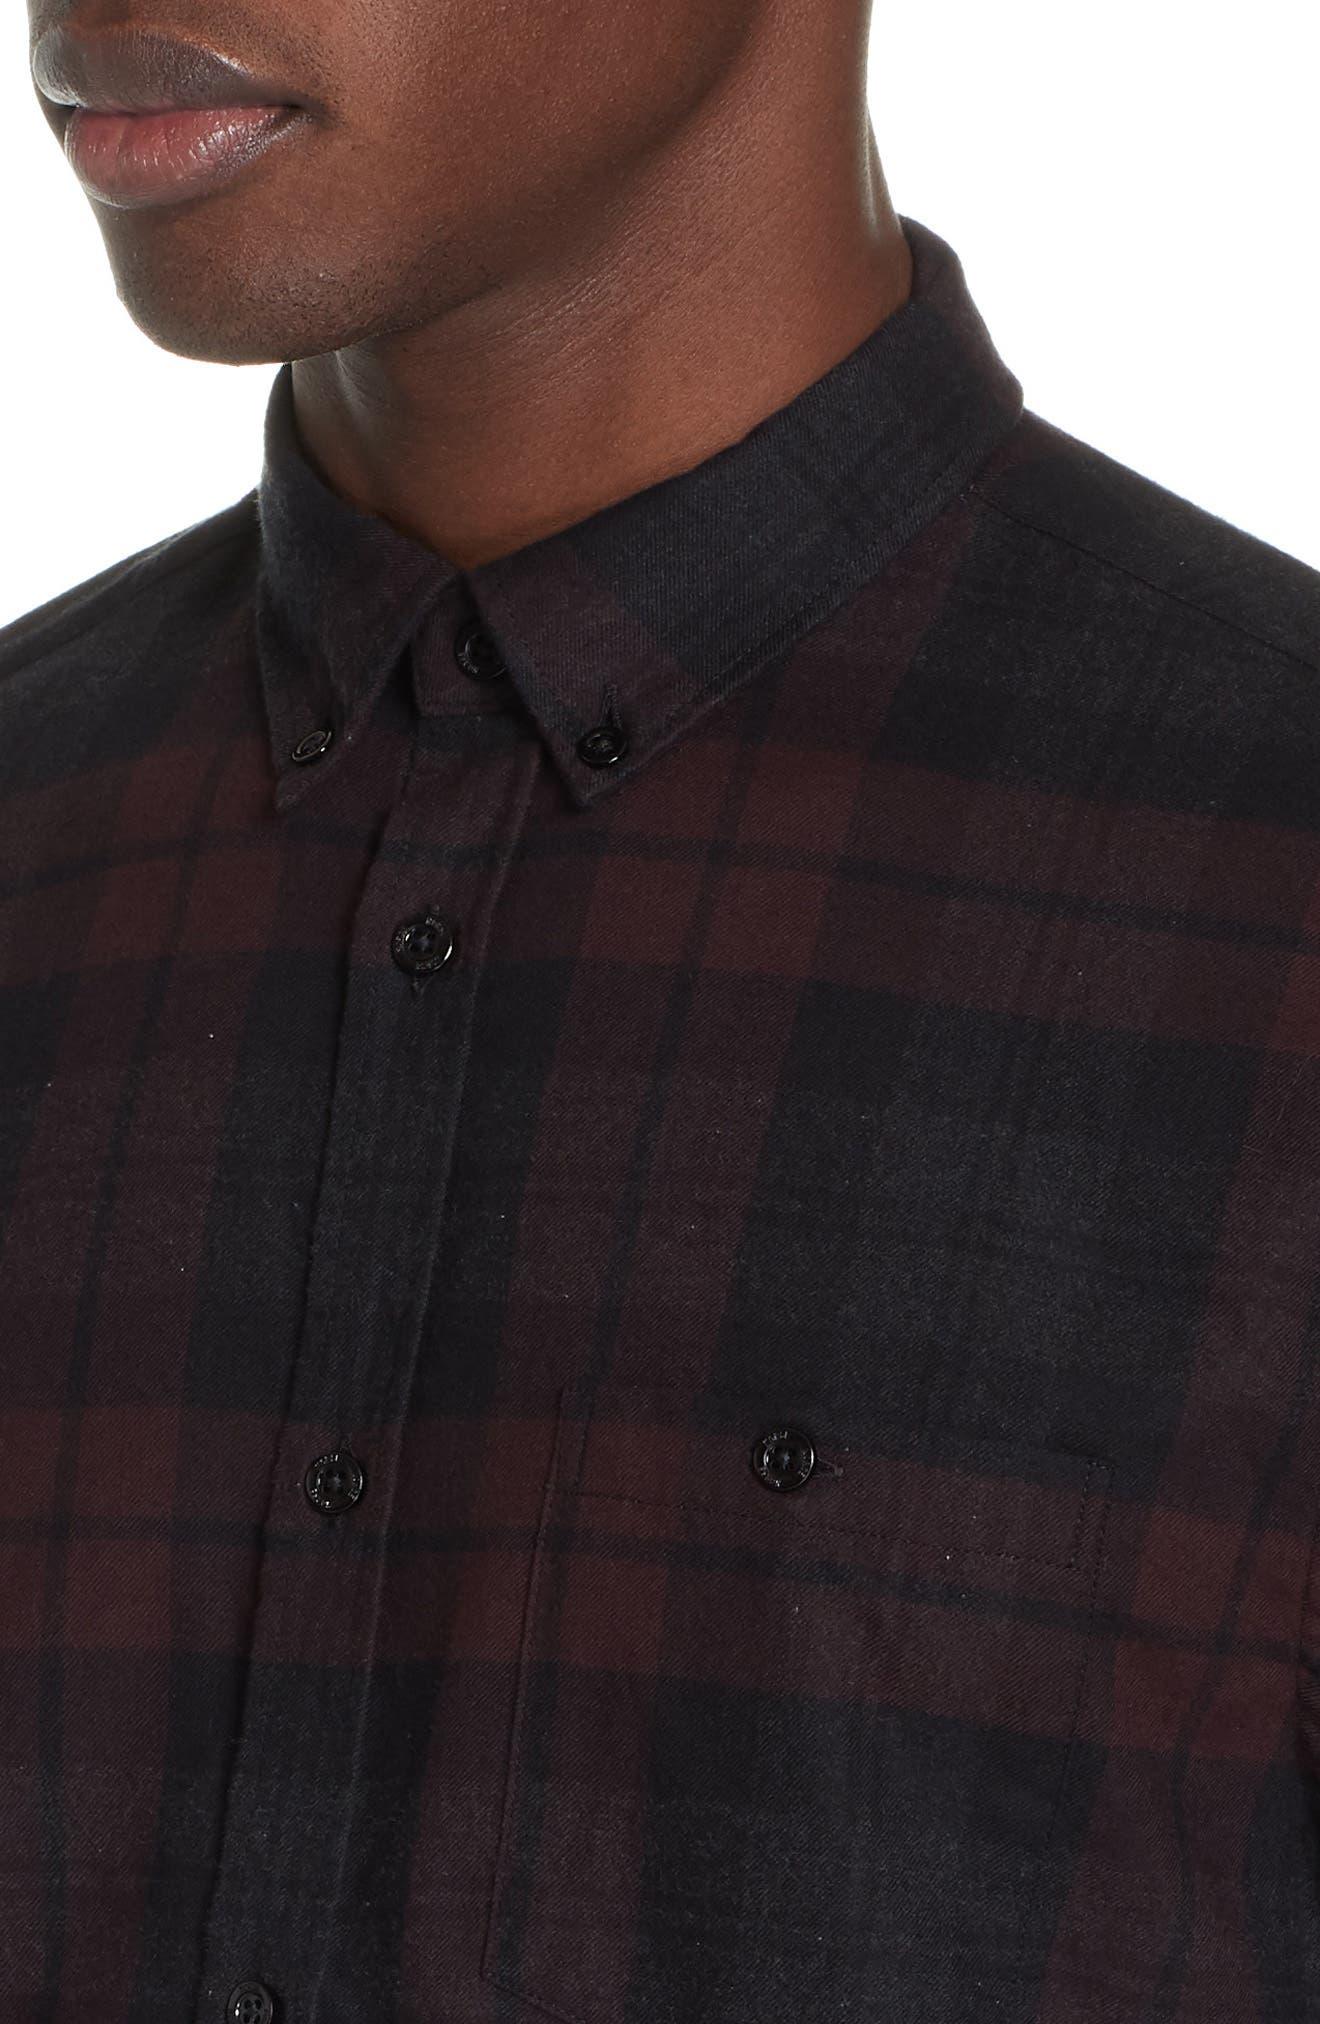 Anton Flannel Sport Shirt,                             Alternate thumbnail 2, color,                             200